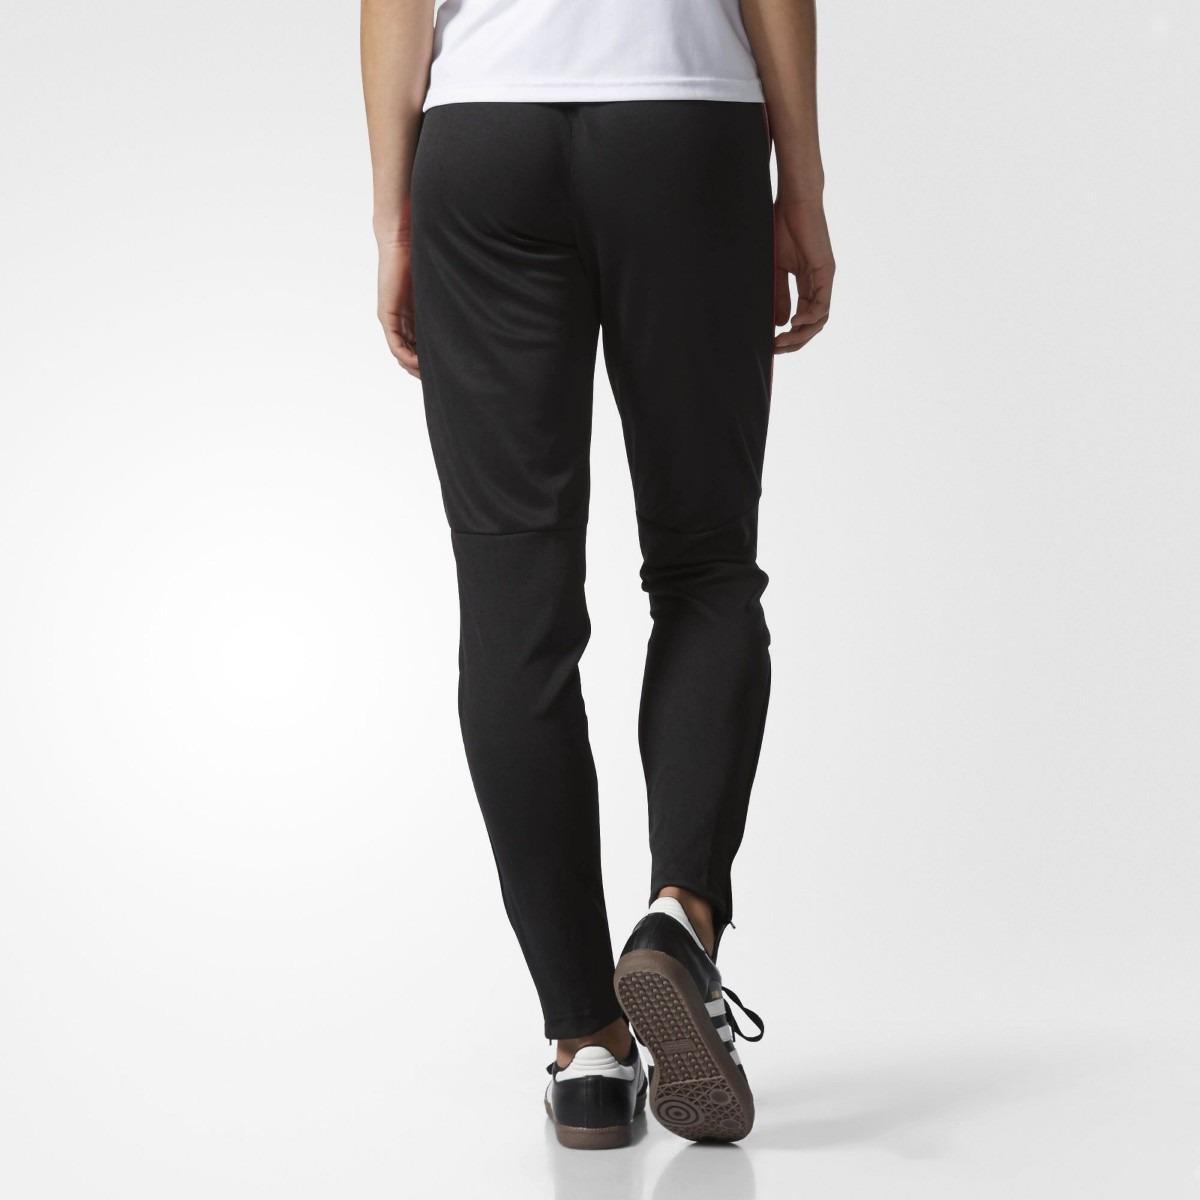 14f3b4e6d2484 pants adidas tiro 17 skinny de mujer nuevos 100% originales. Cargando zoom.